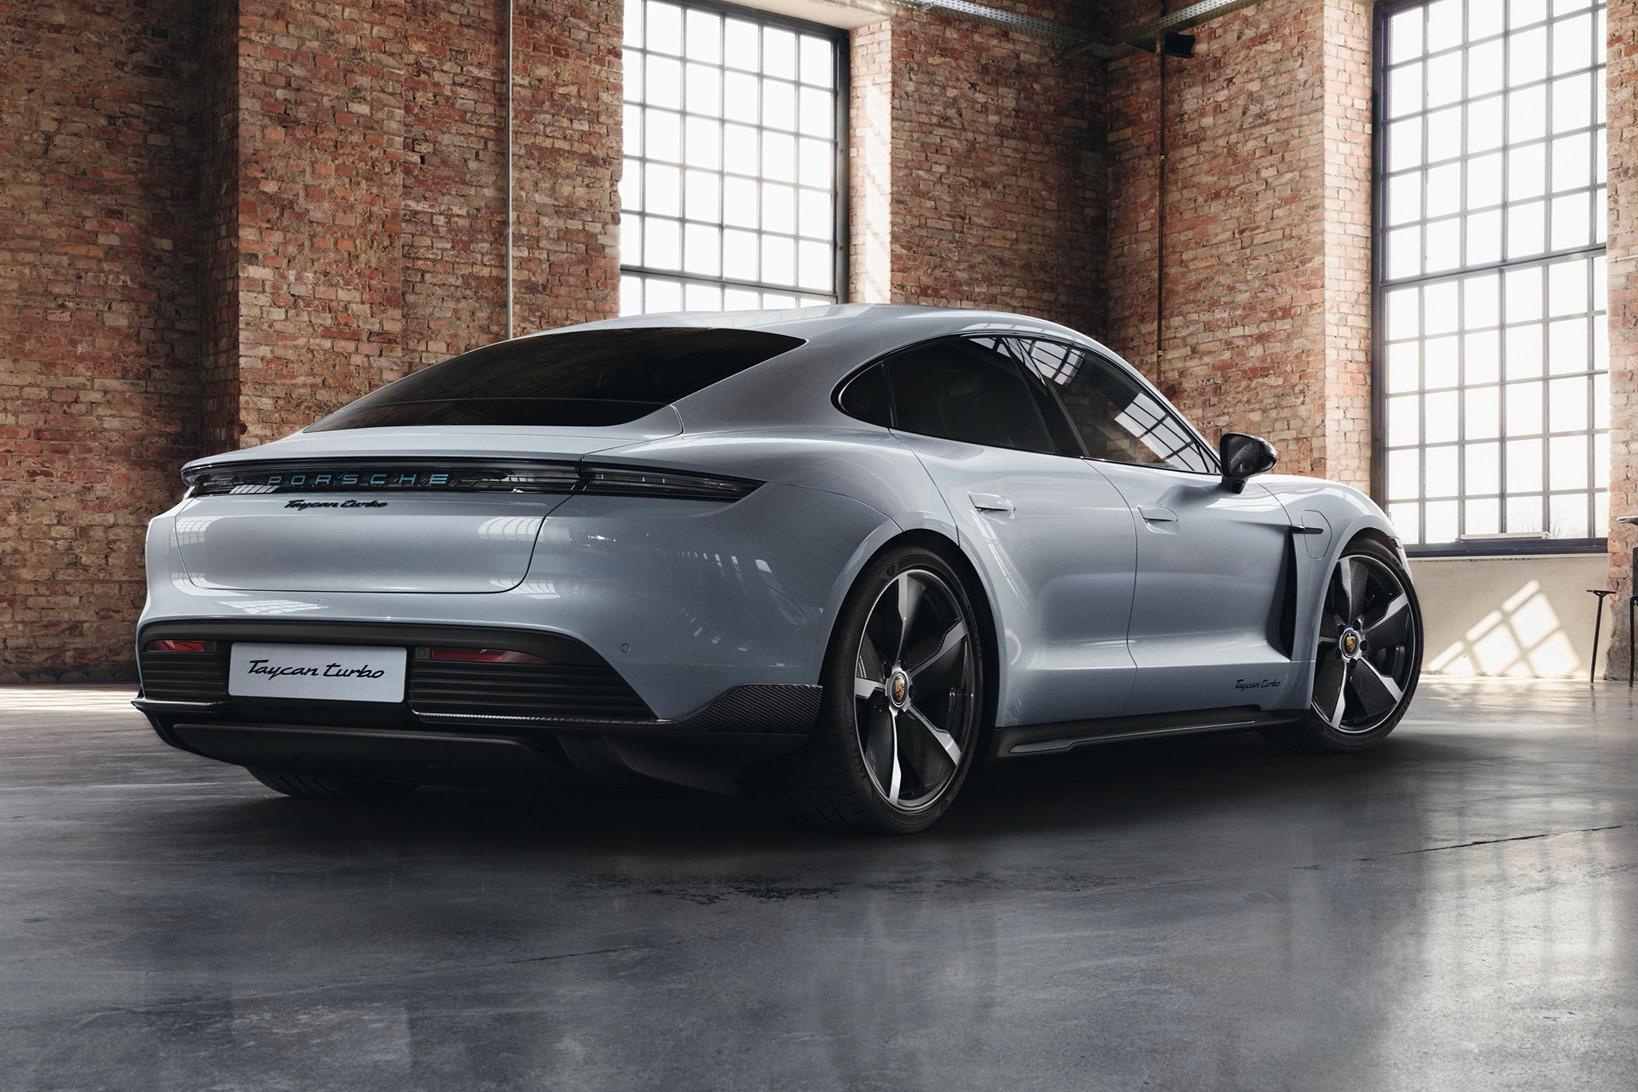 Porsche-Exclusive-Taycan-Turbo-7